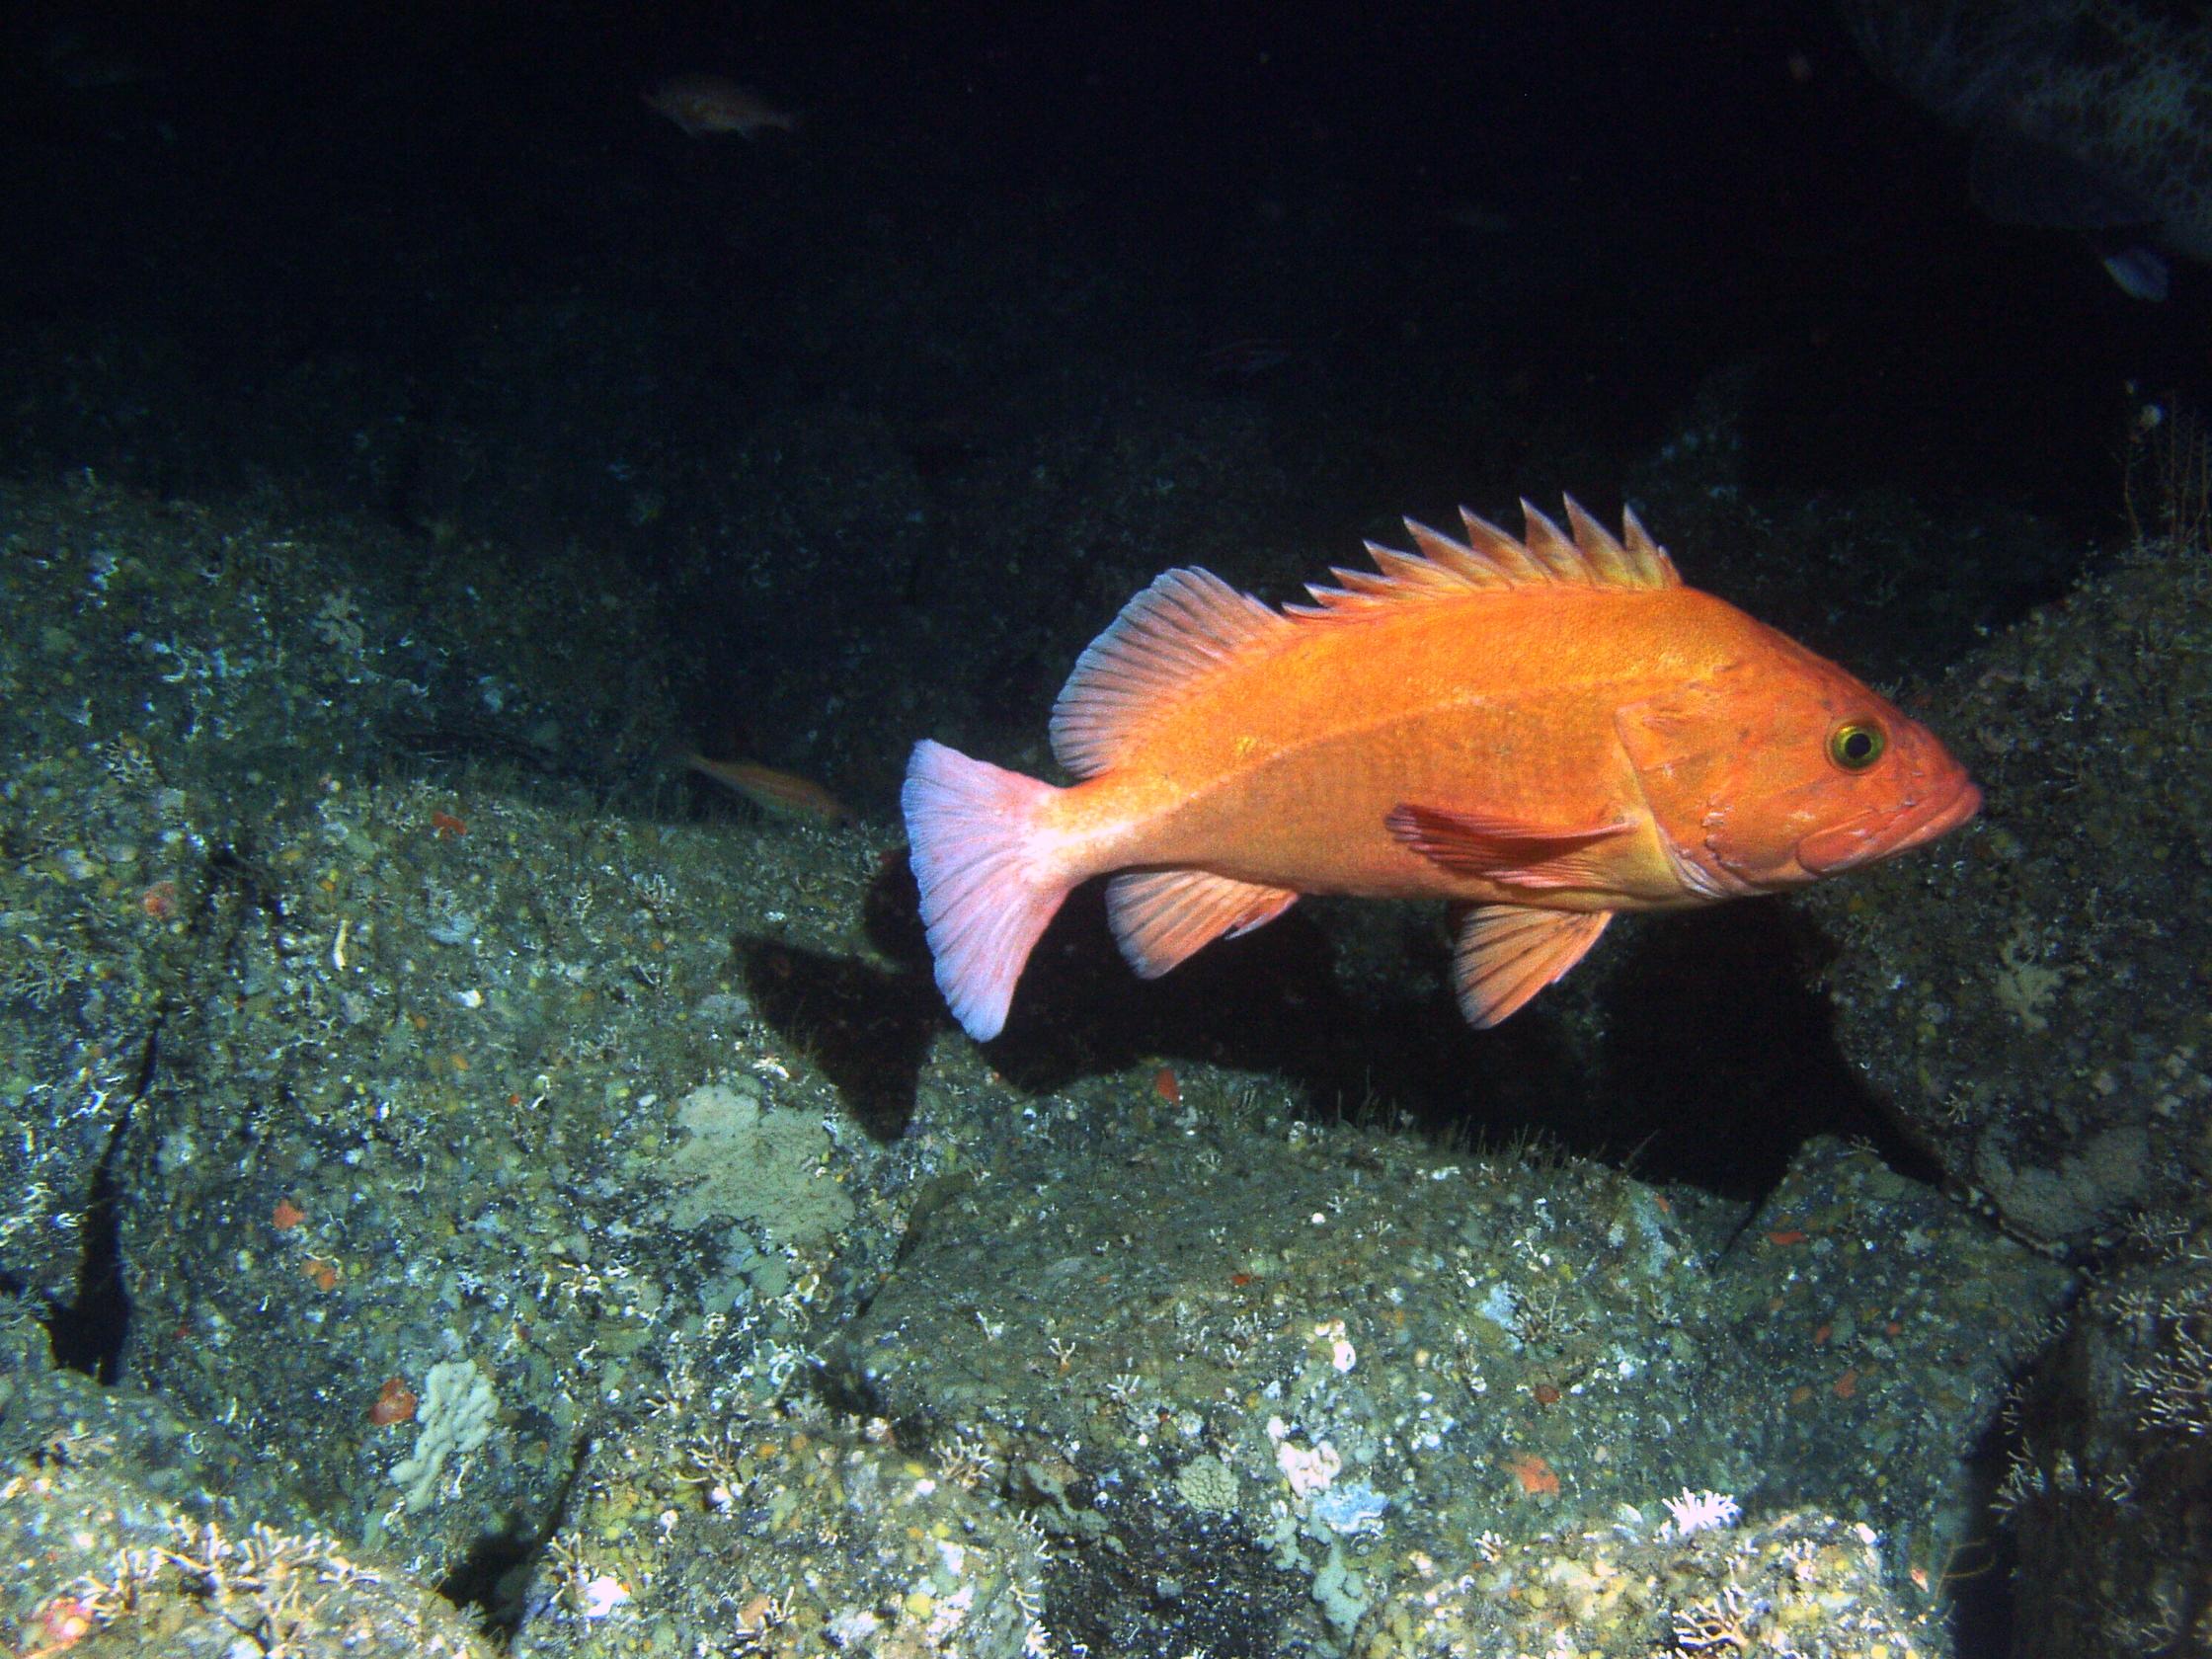 old fish few and far between under fishing pressure uw news